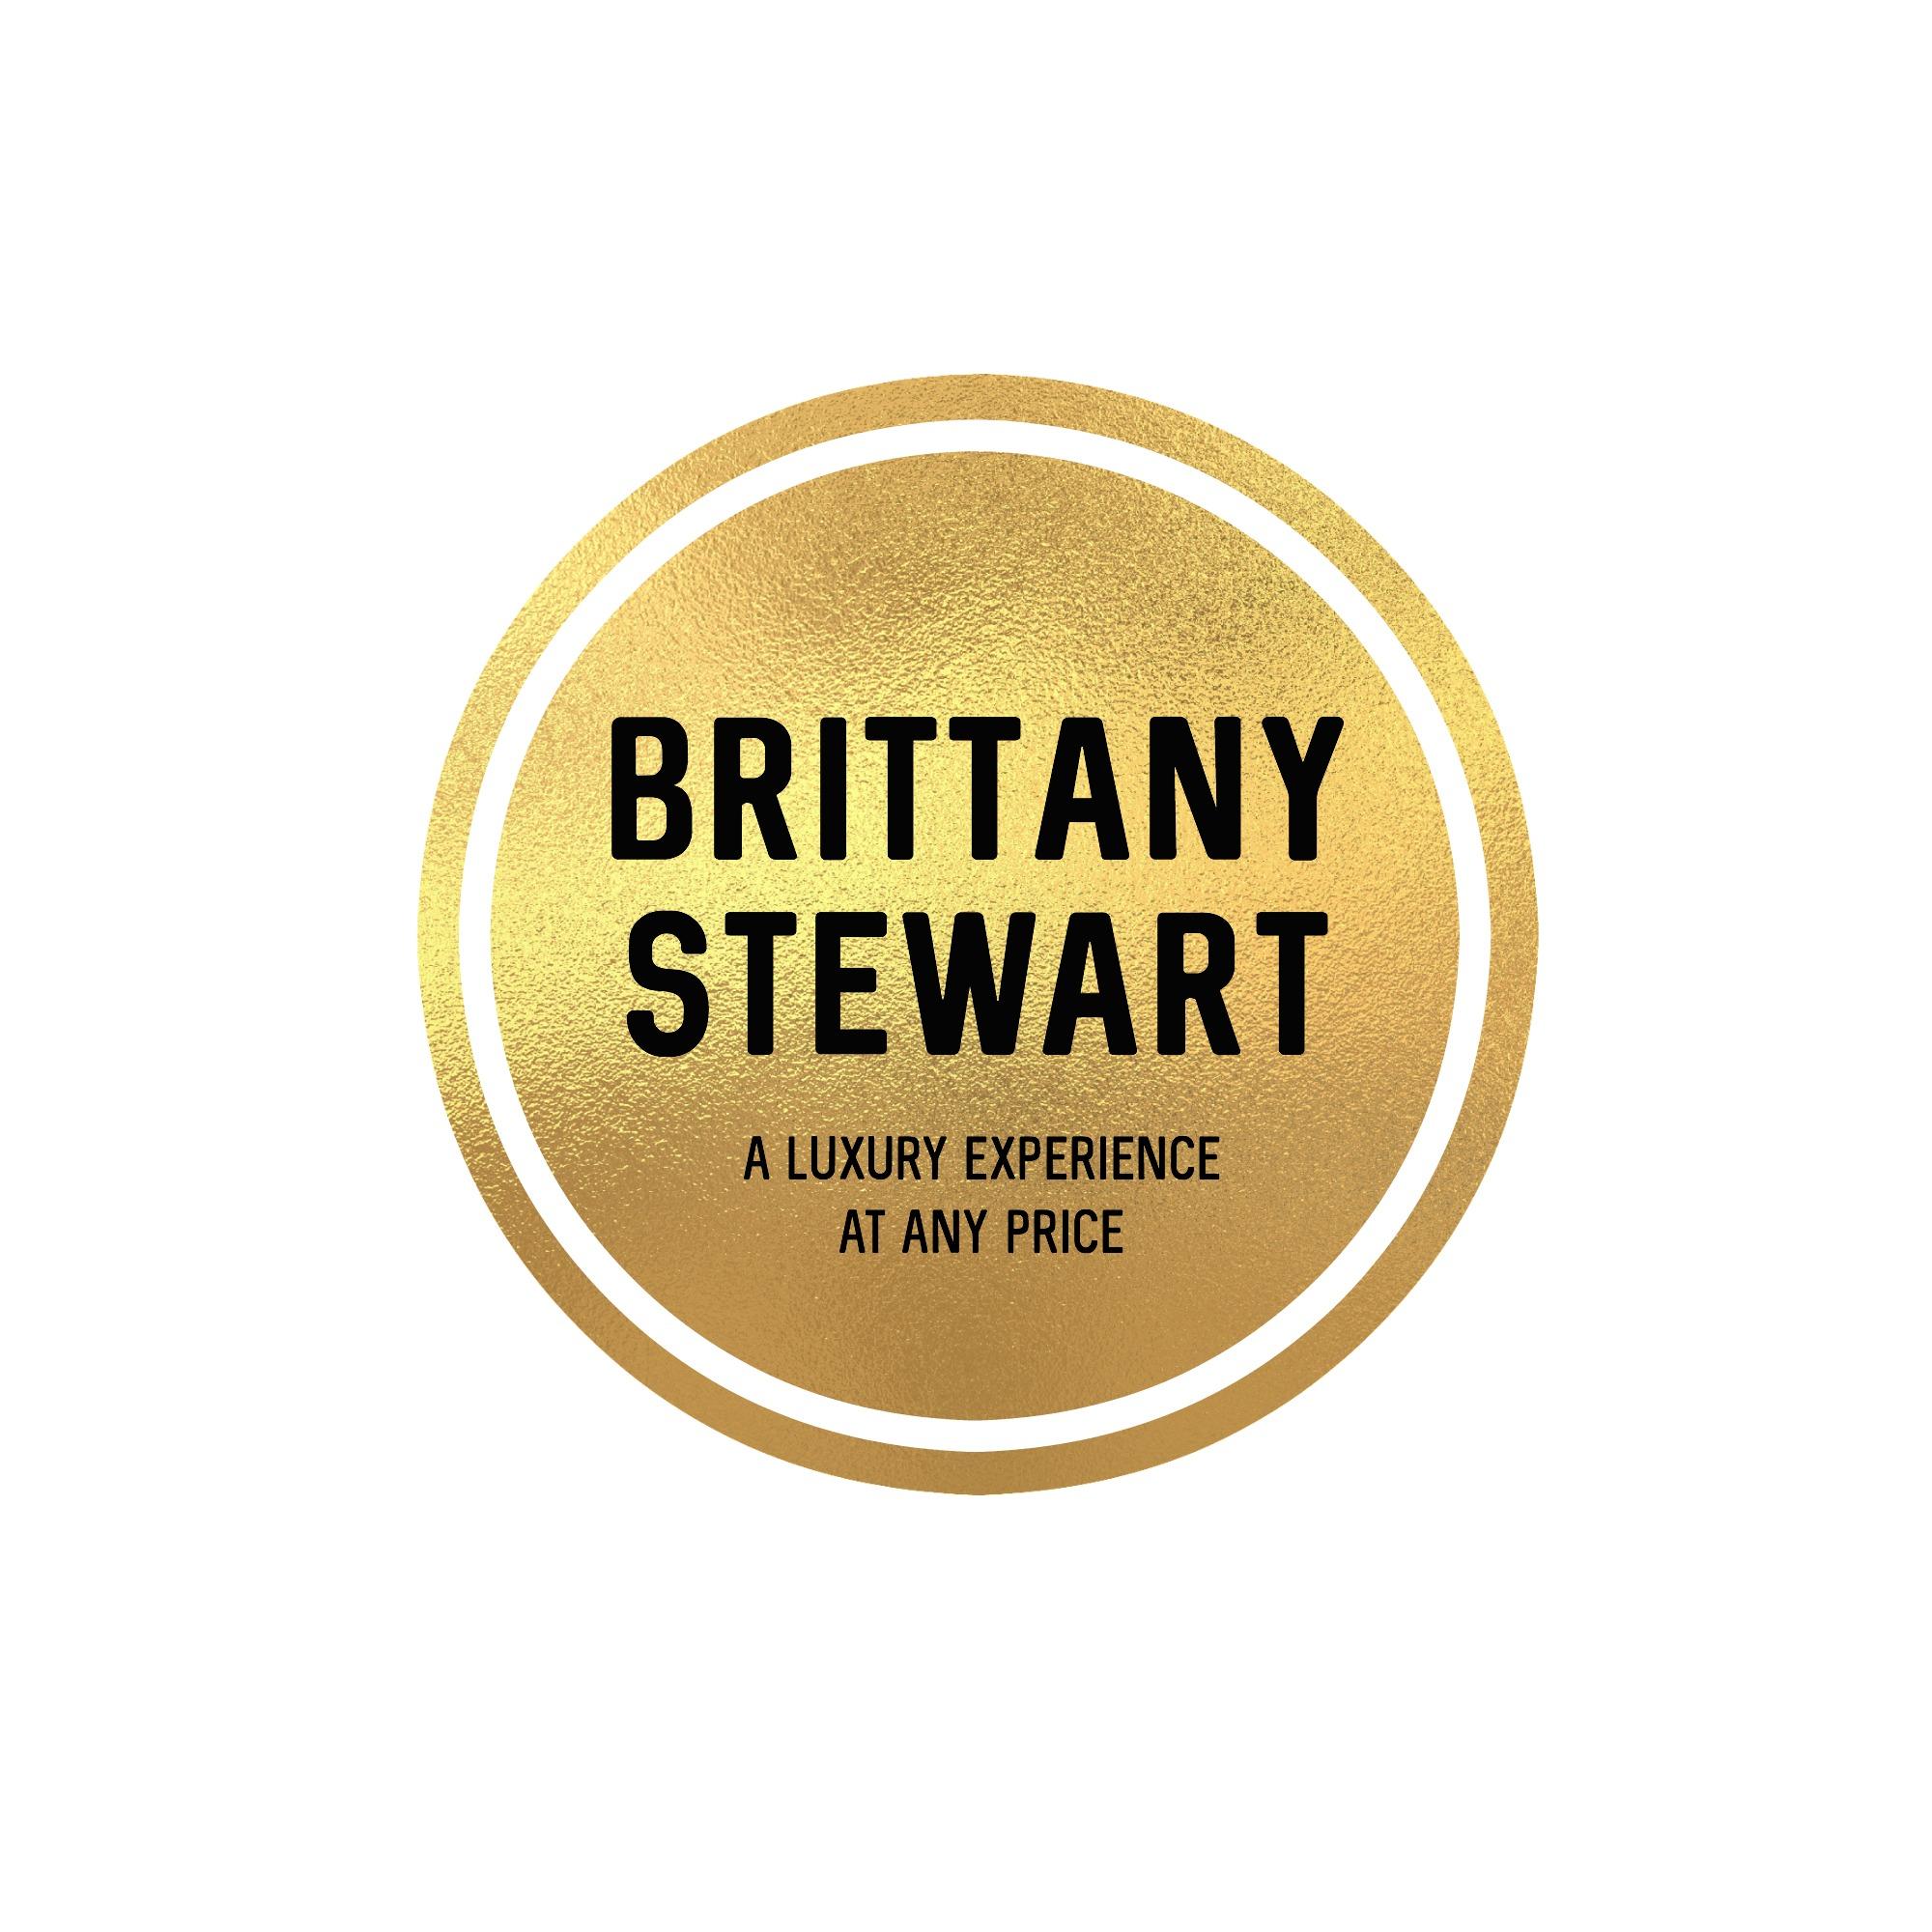 Brittany Stewart LOGO.jpg